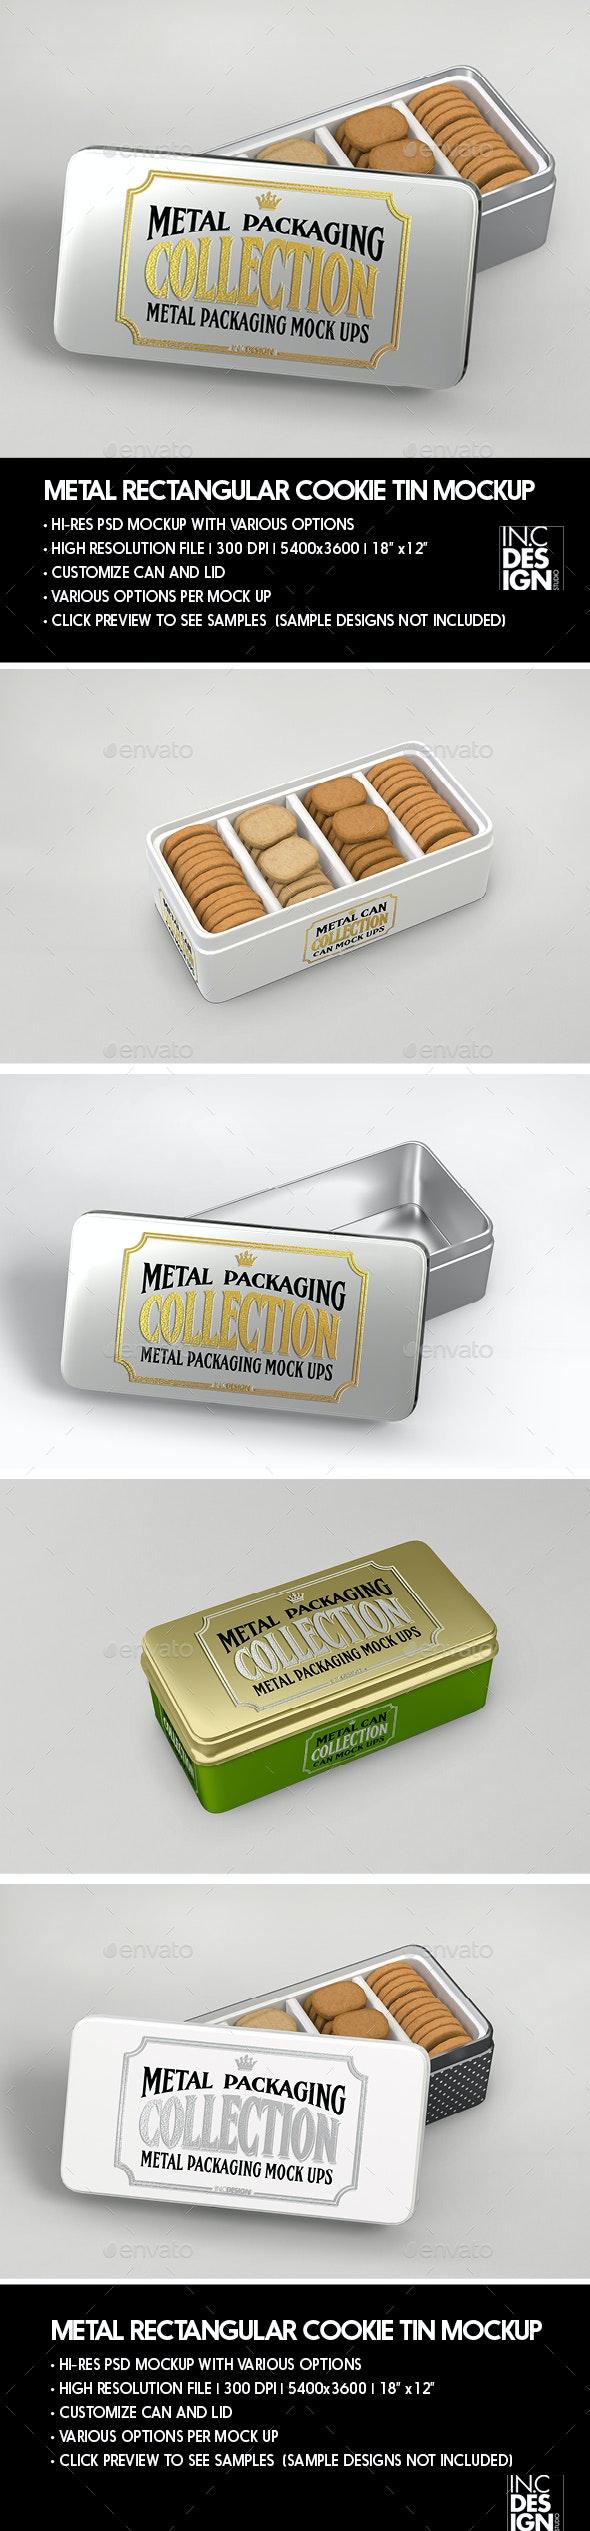 Metal Rectangular Cookie Tin  Packaging Mockup - Food and Drink Packaging